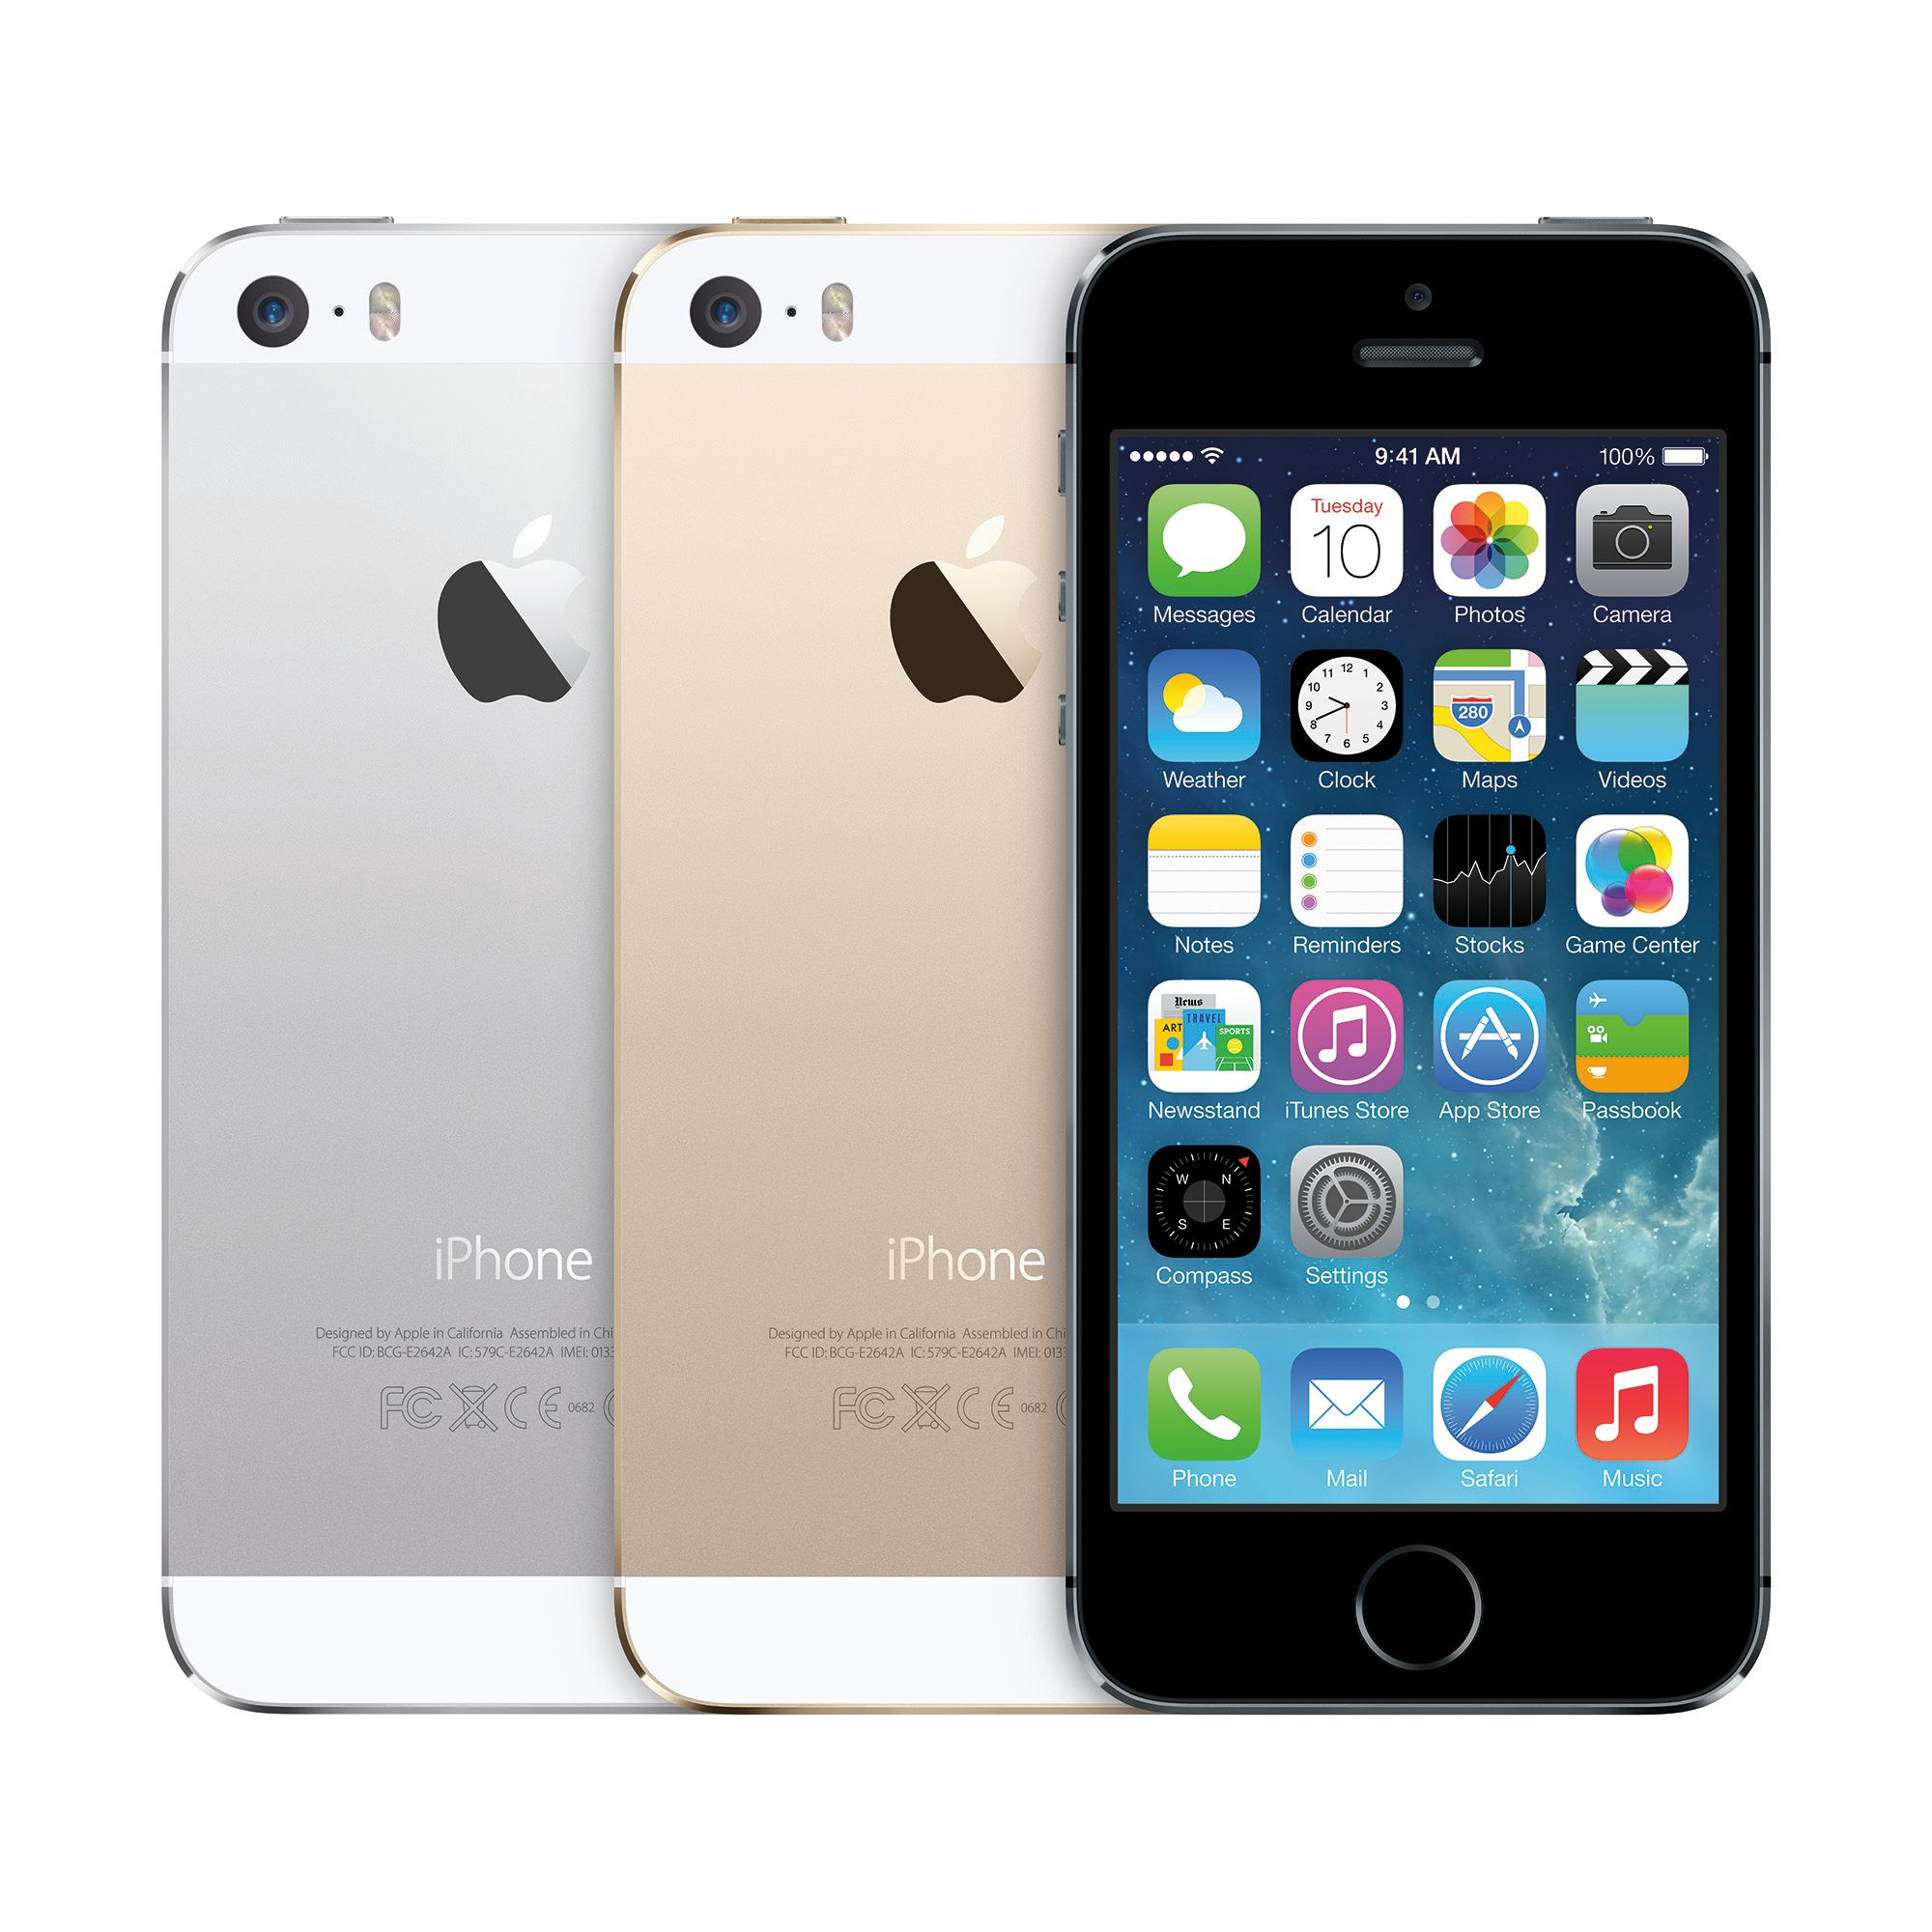 Total Wireless Apple iPhone 5S 16GB Prepaid Smartphone - Walmart.com